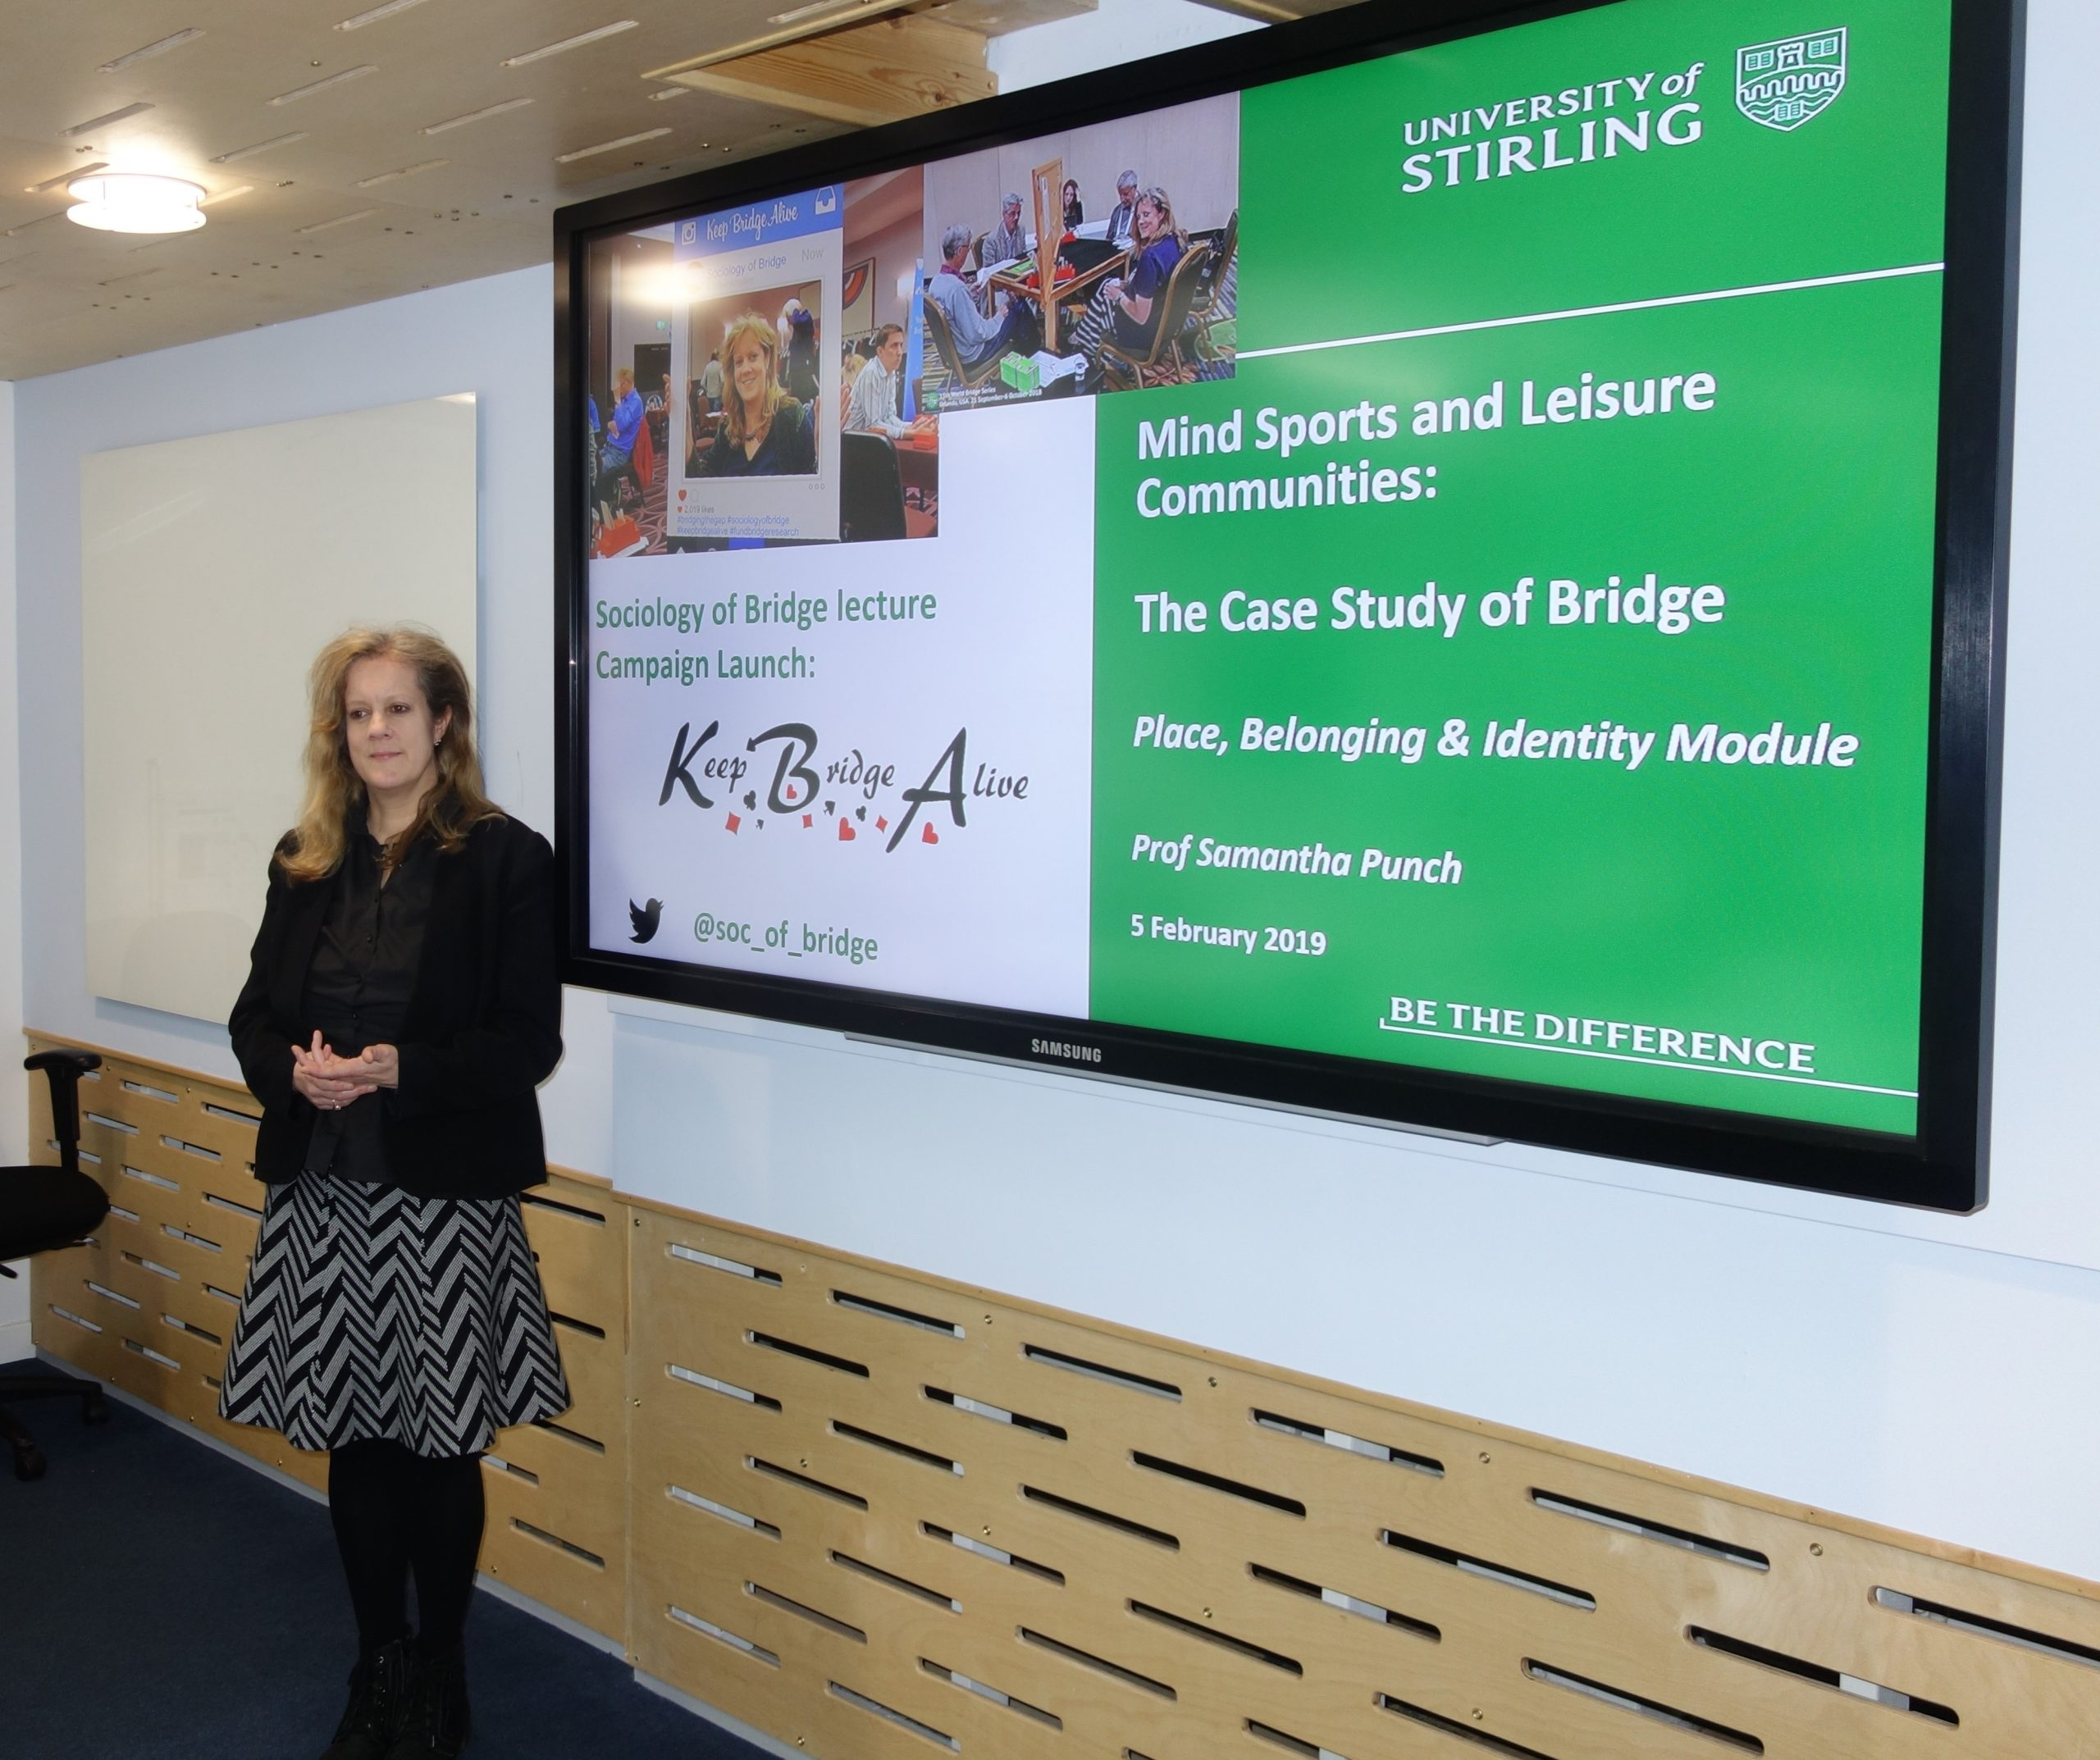 Samantha Punch presents the case study of bridge